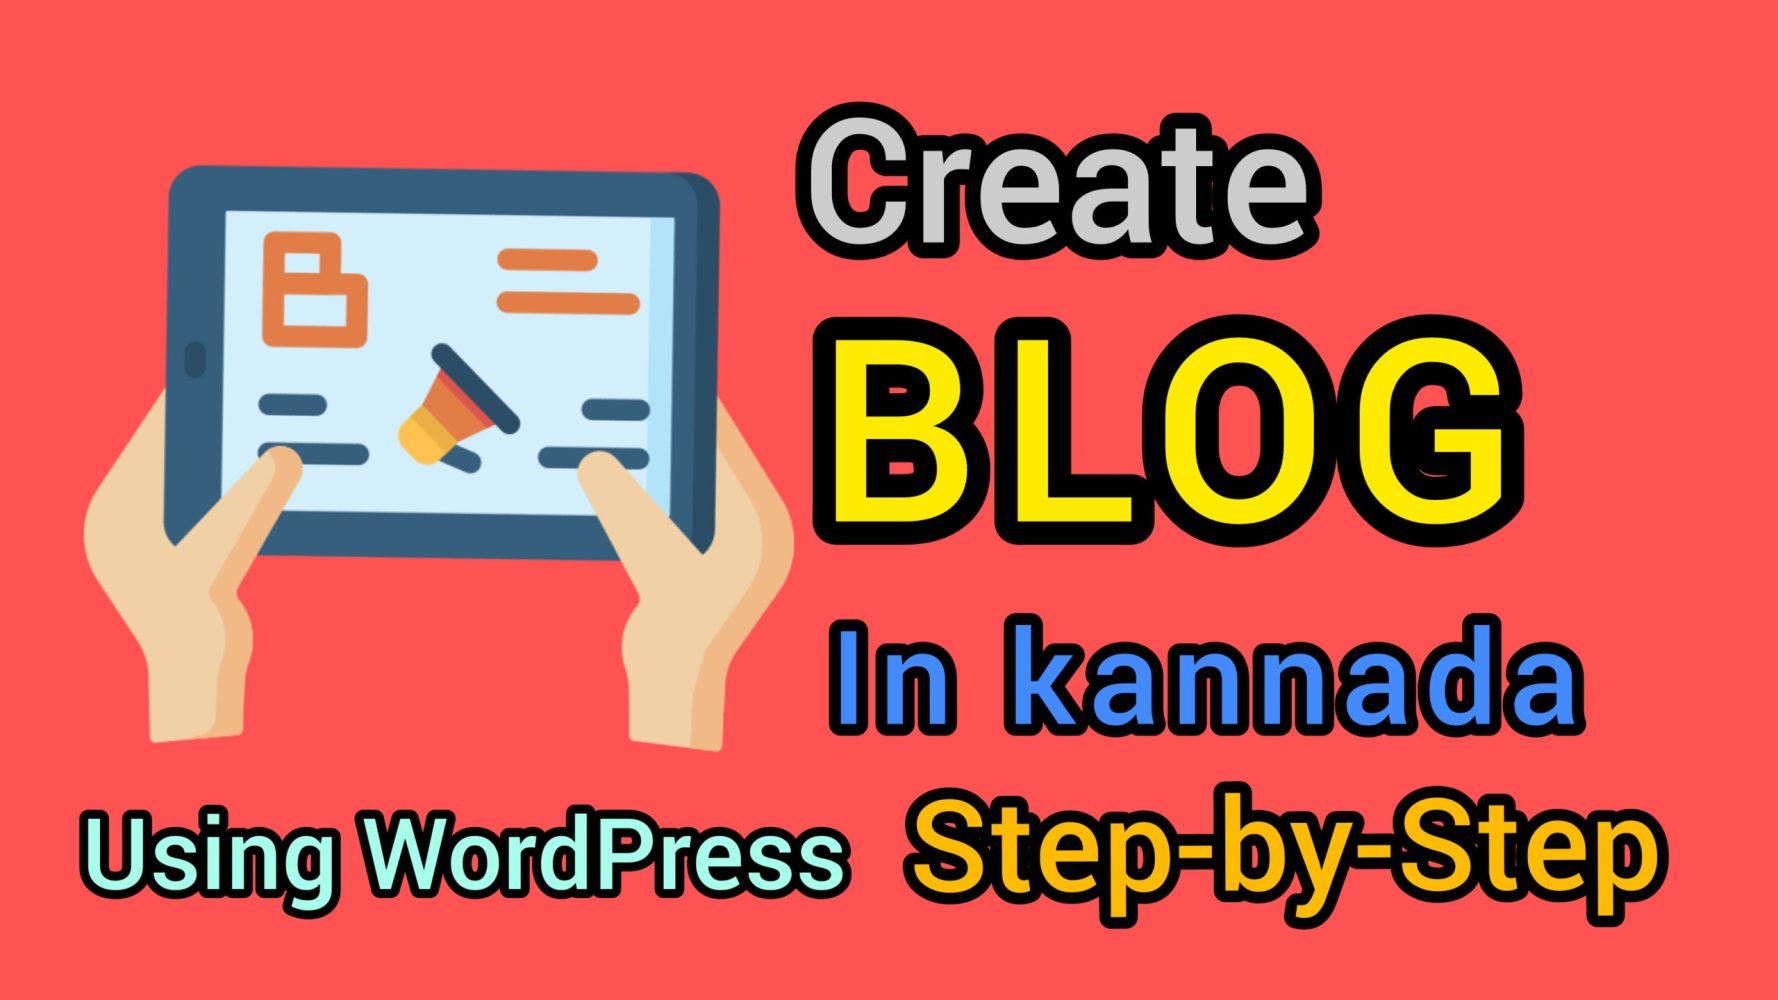 Create Blog in Kannada